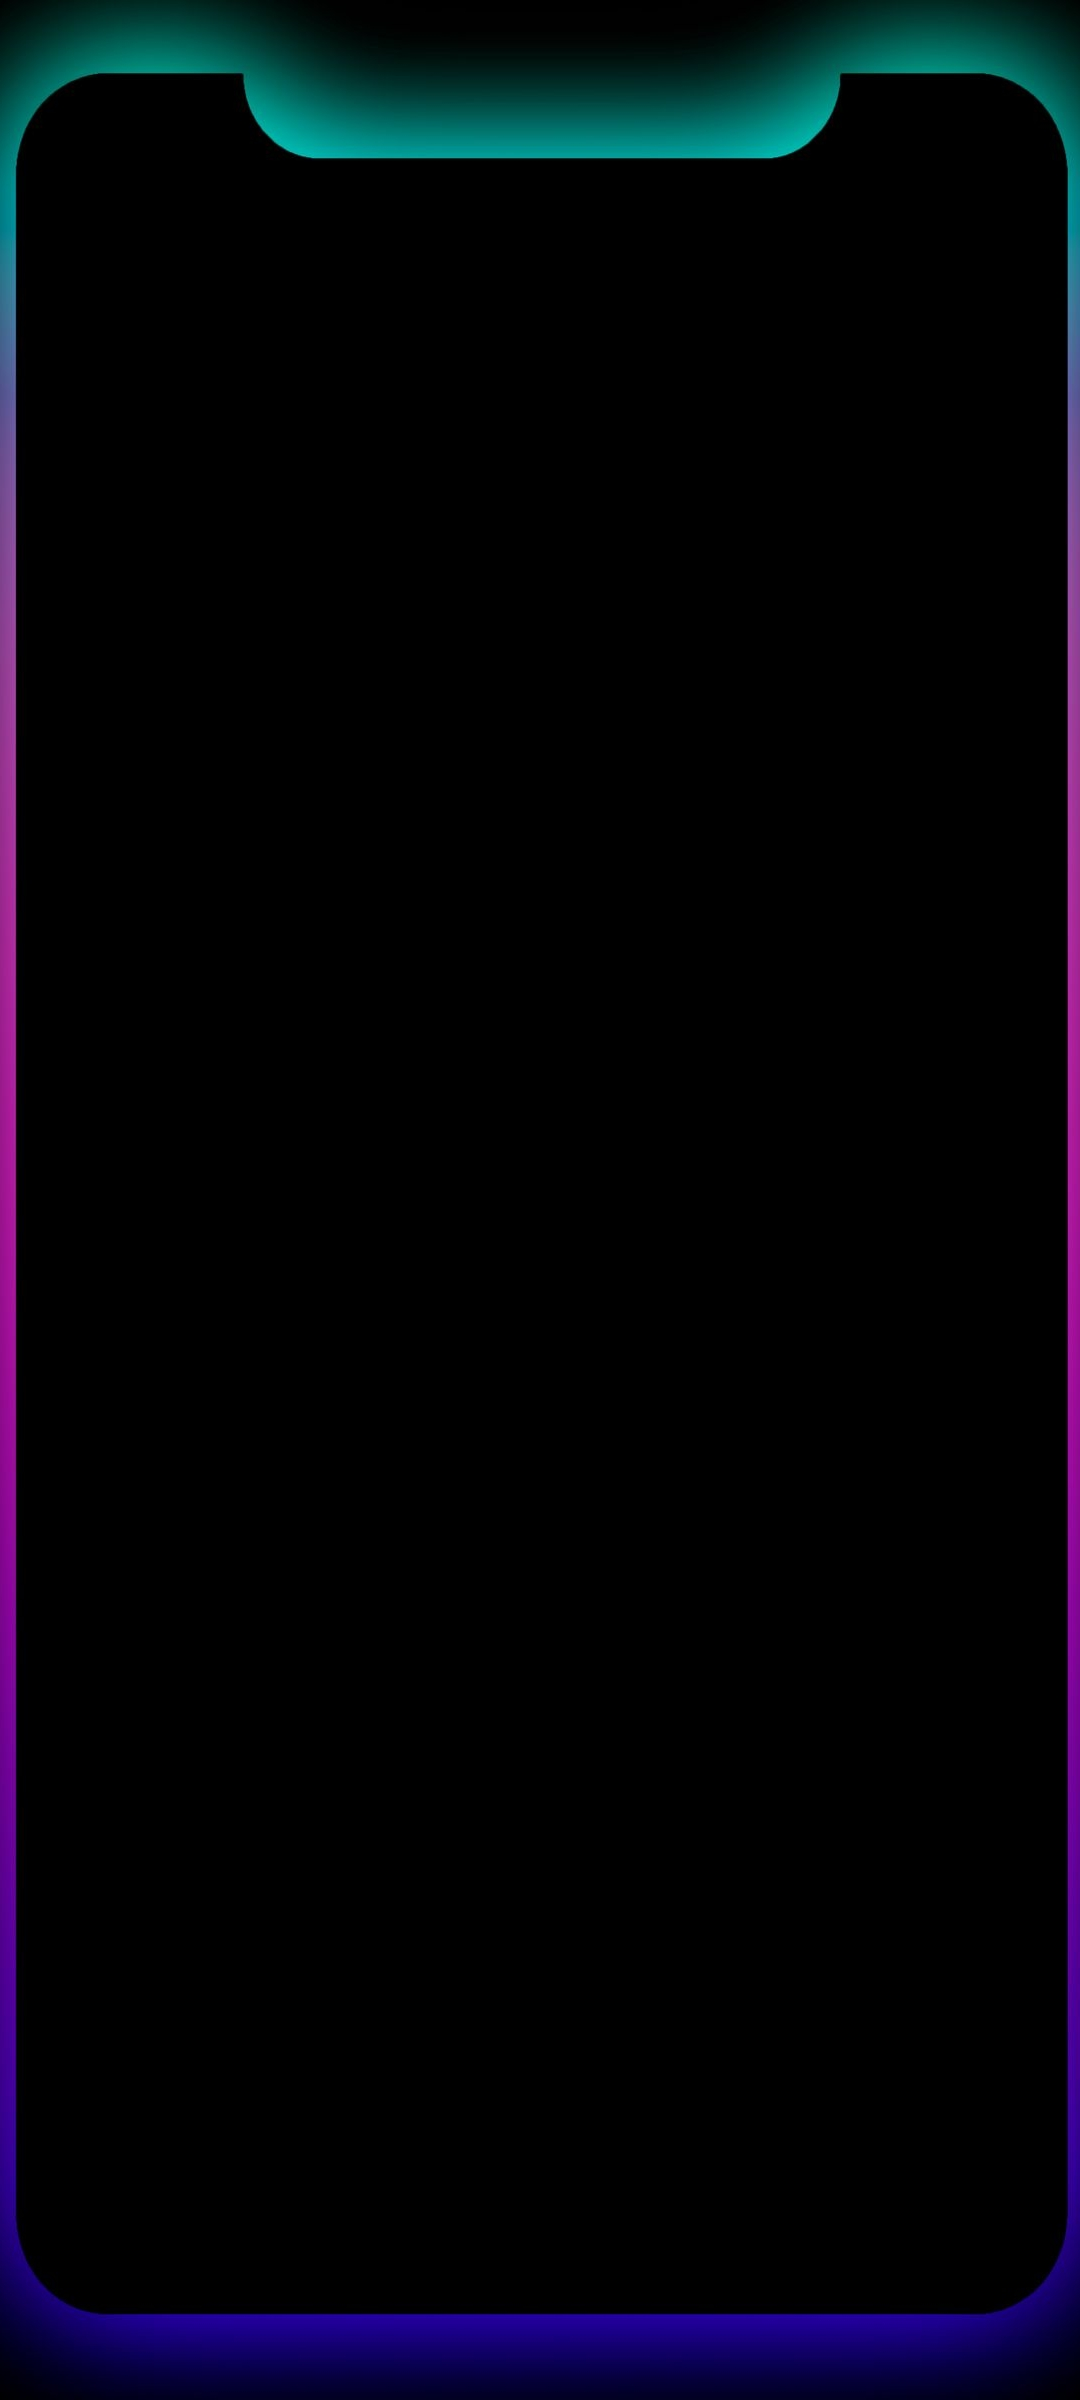 Iphone Notch Wallpaper : iphone, notch, wallpaper, Border, AMOLED, Black, Notch, Wallpaper